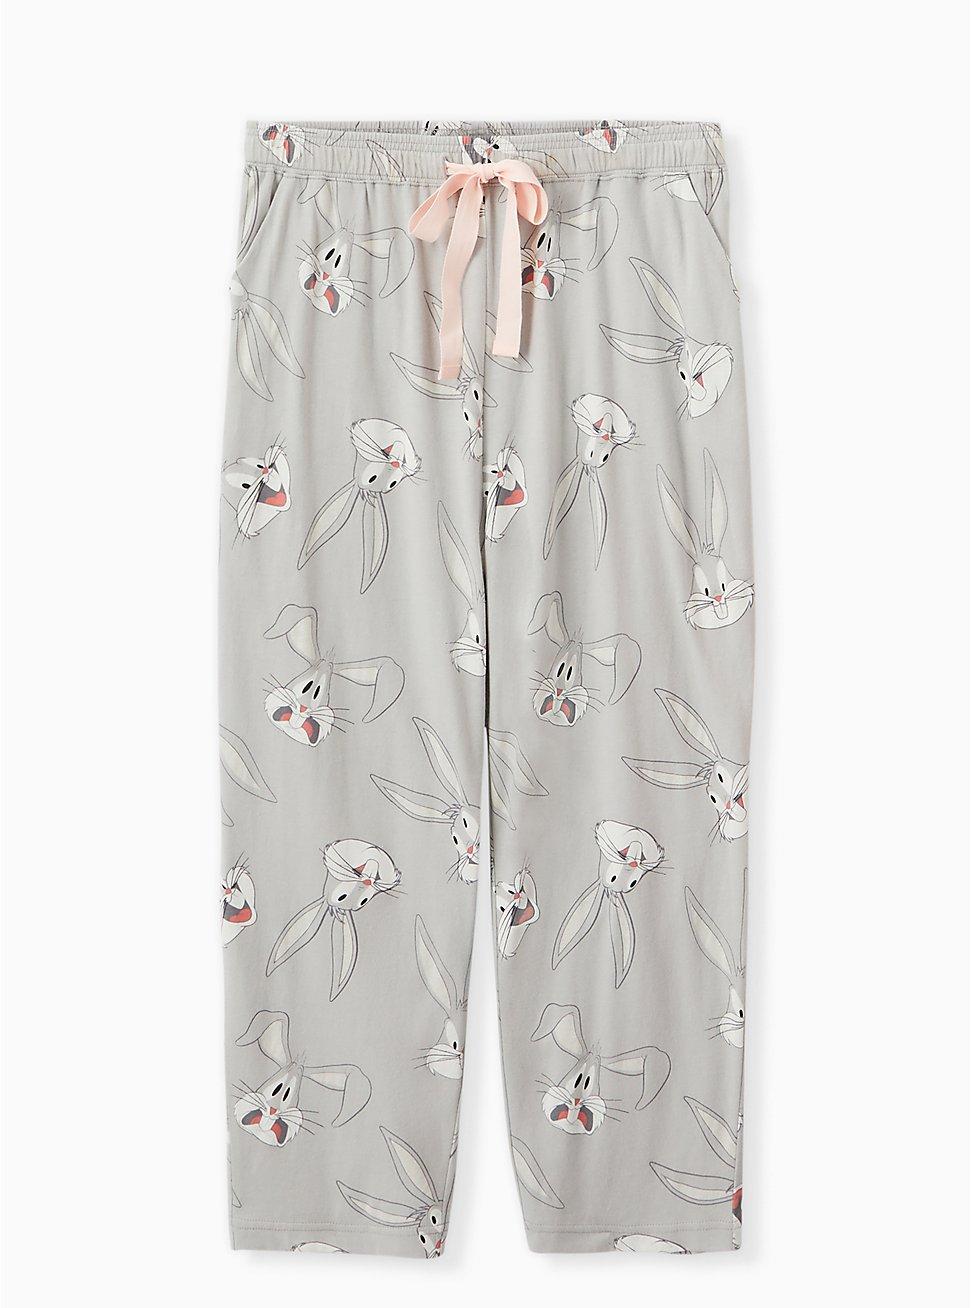 Looney Tunes Bug Bunny Grey Crop Sleep Pant, GREY, hi-res